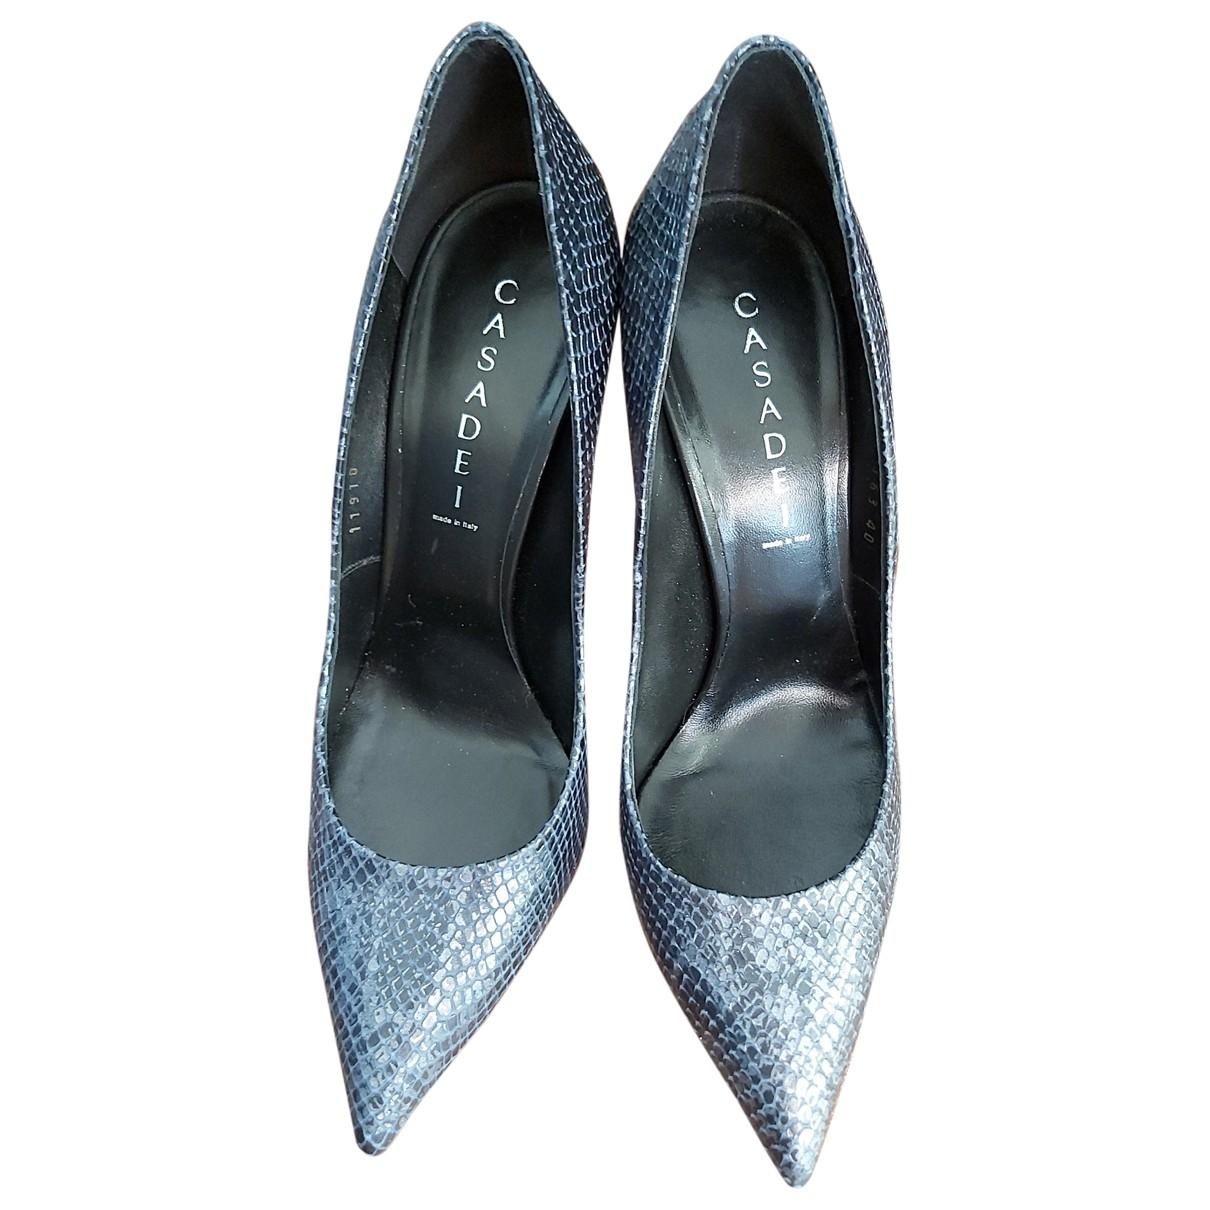 Casadei \N Blue Leather Heels for Women 40 EU